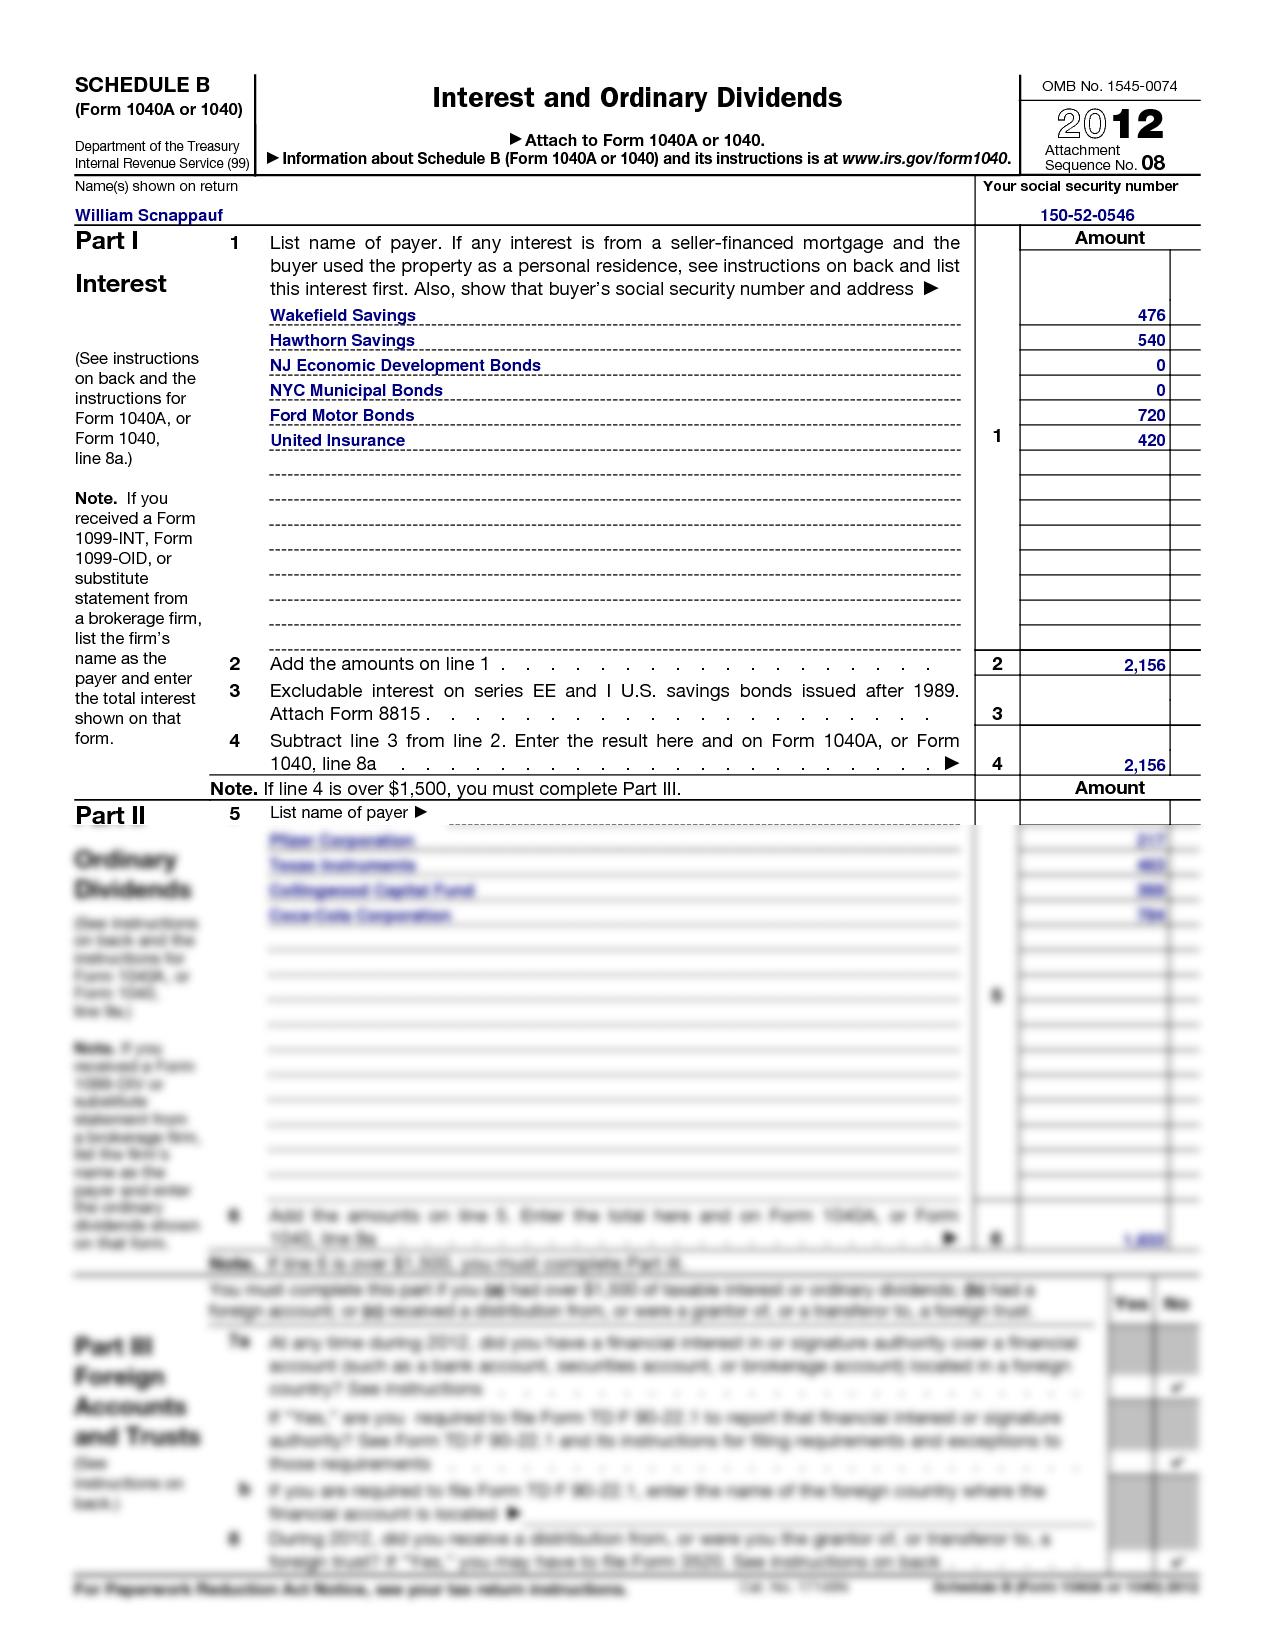 B form 1040 2013 schedule b form 1040 2013 falaconquin